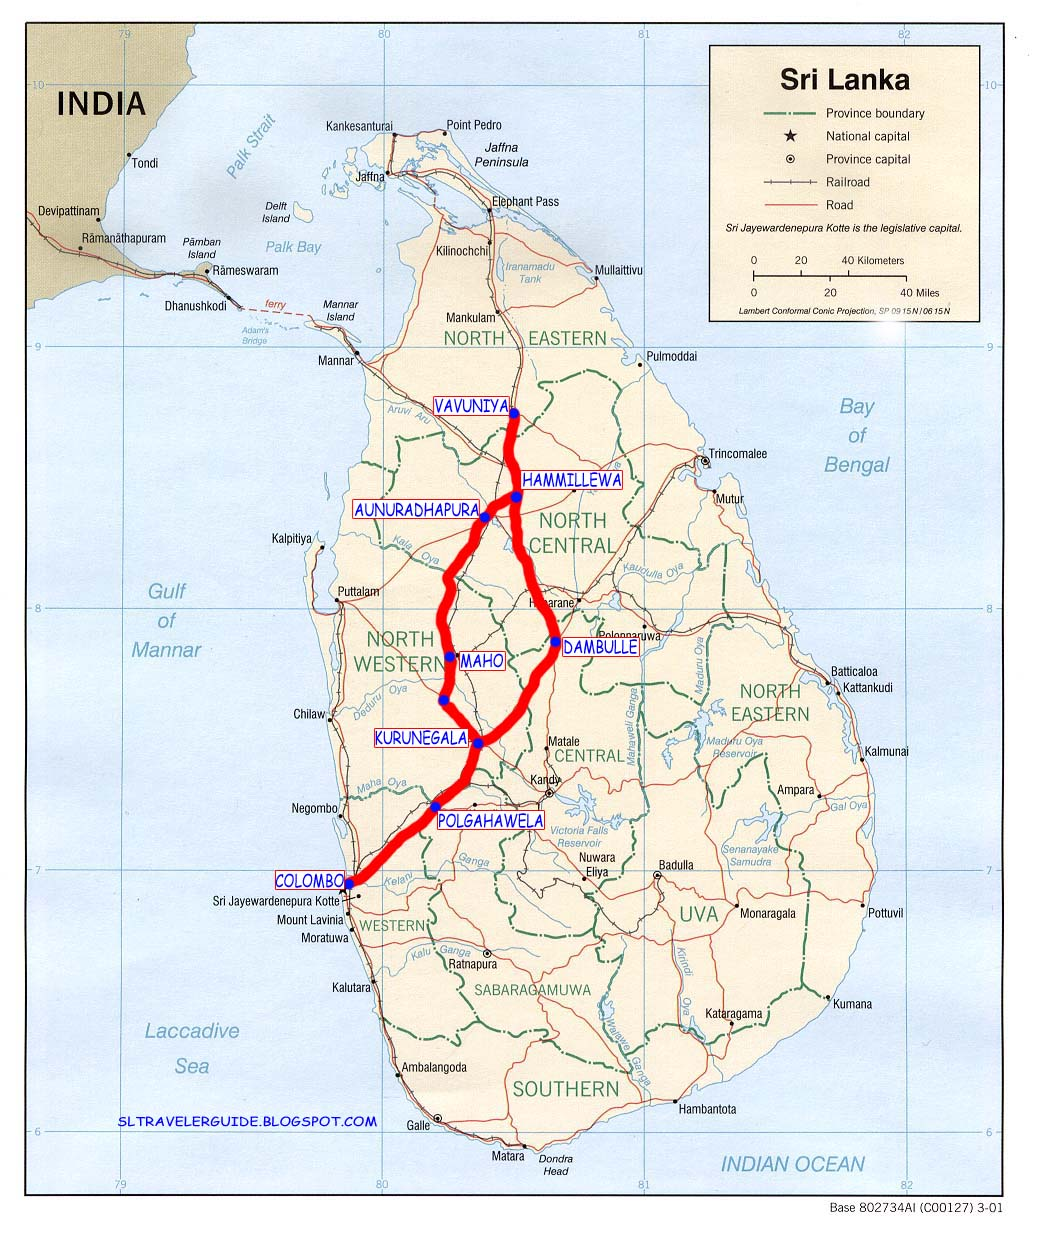 Vavuniya Sri Lanka  city pictures gallery : Sri Lanka Travel Guide, best places, maps & all details: VAVUNIYA ...